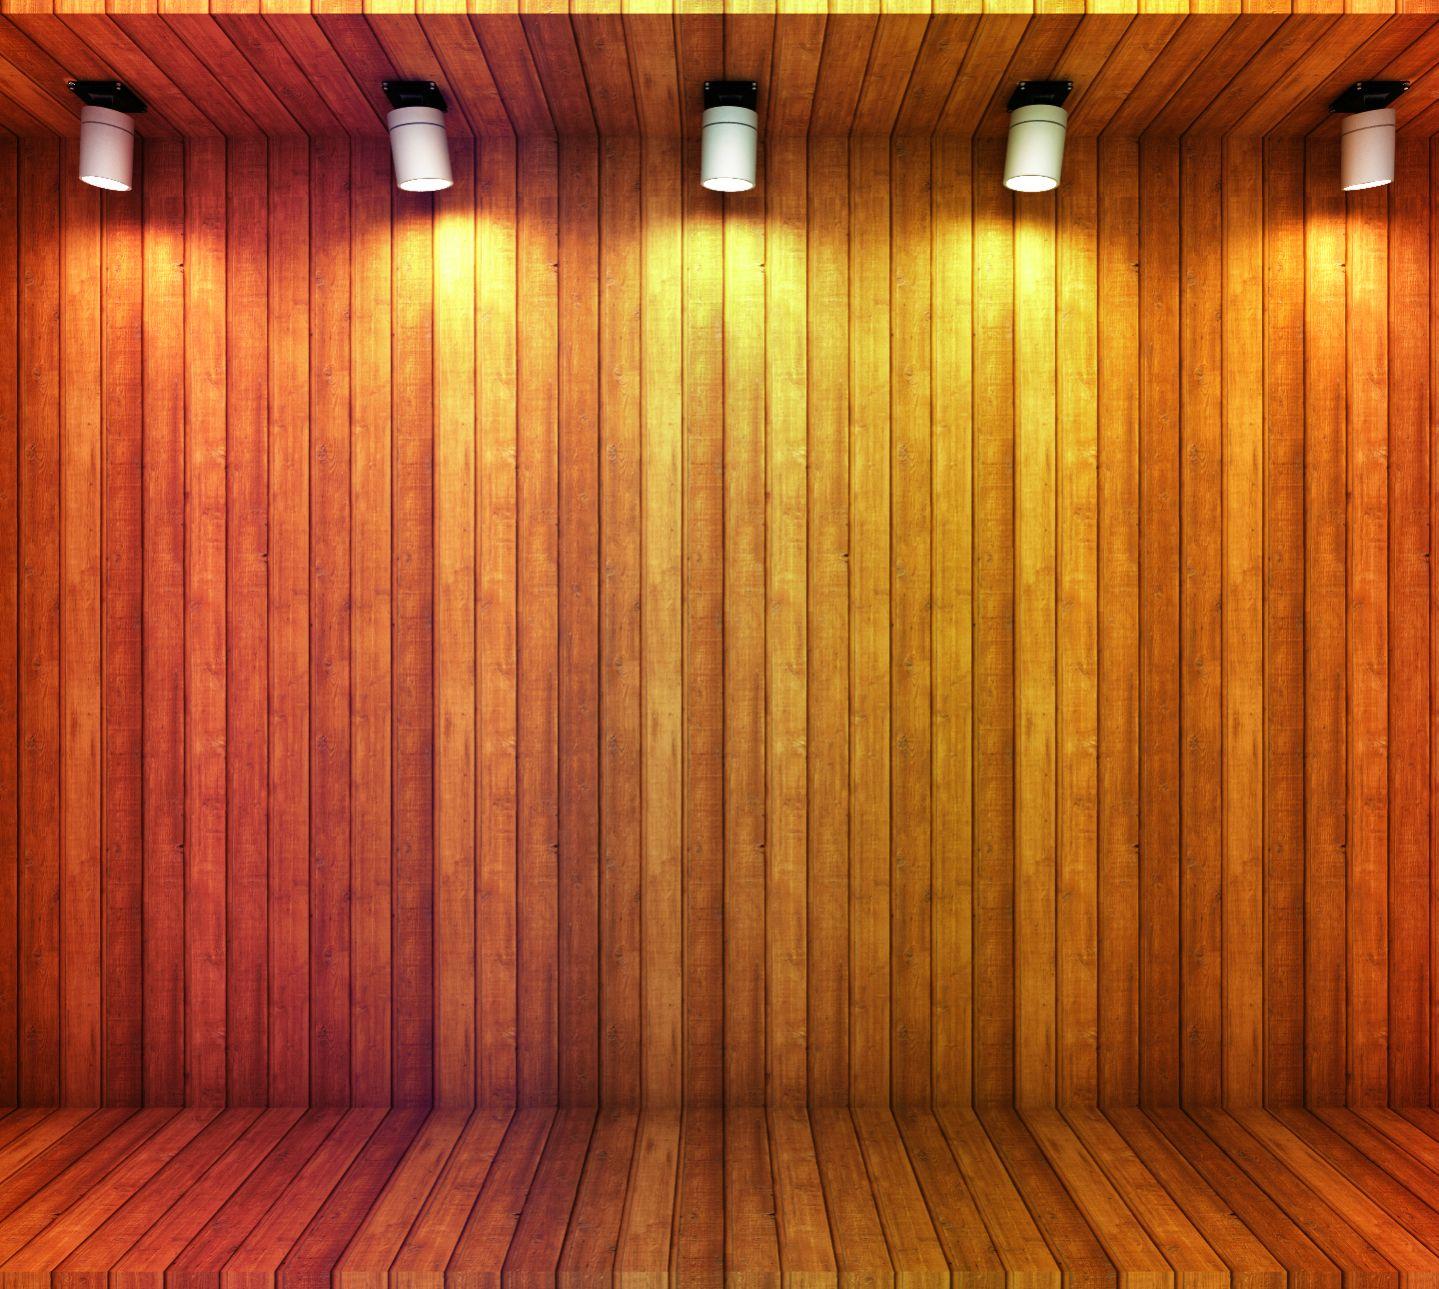 Wooden wall background by jesse on DeviantArt